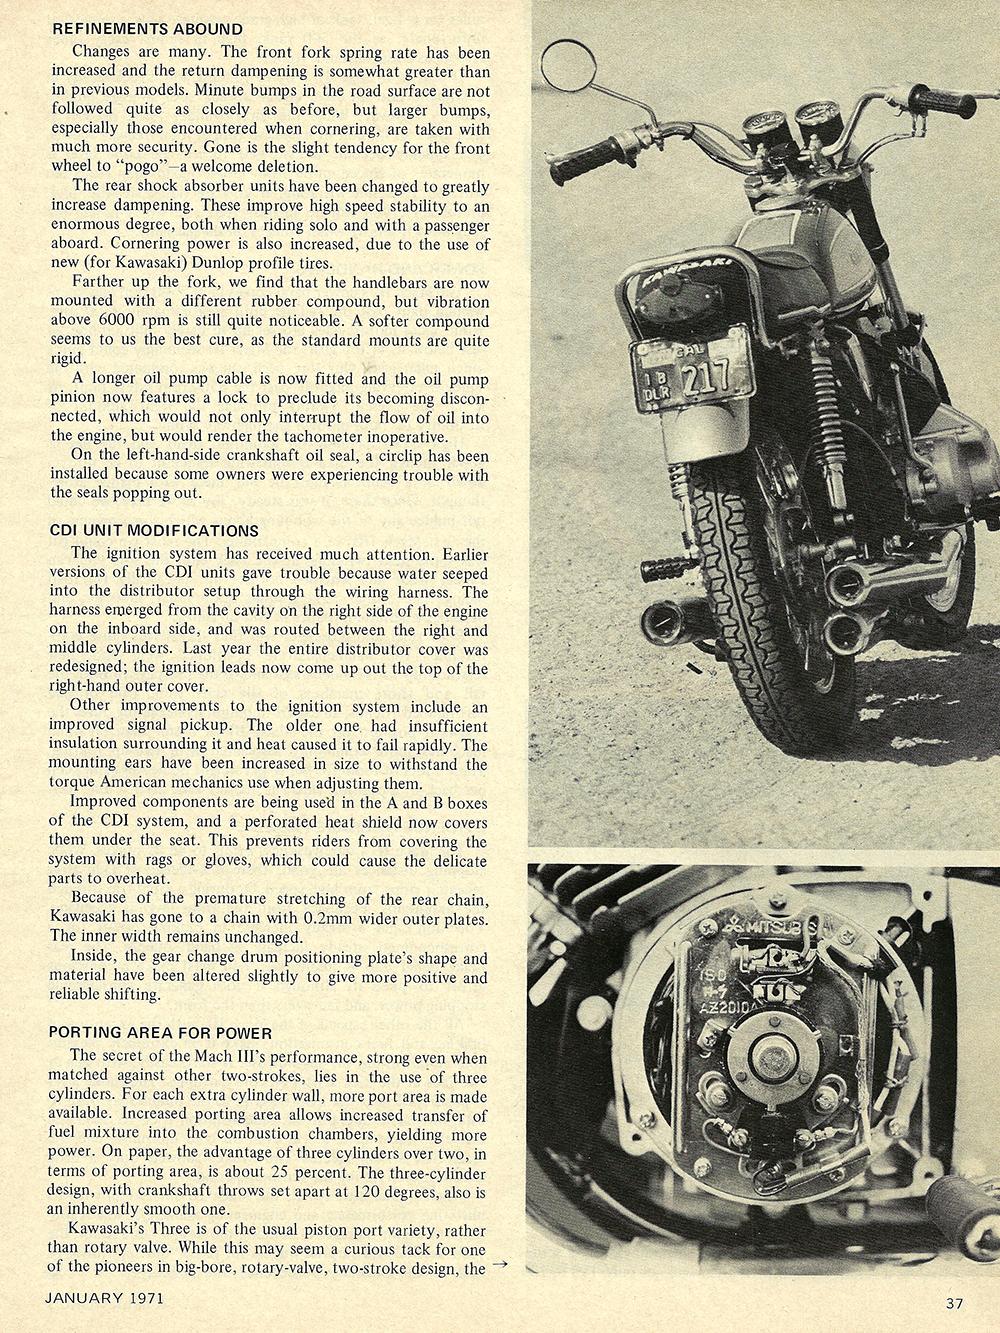 1971 Kawasaki Mach 3 road test 02.jpg